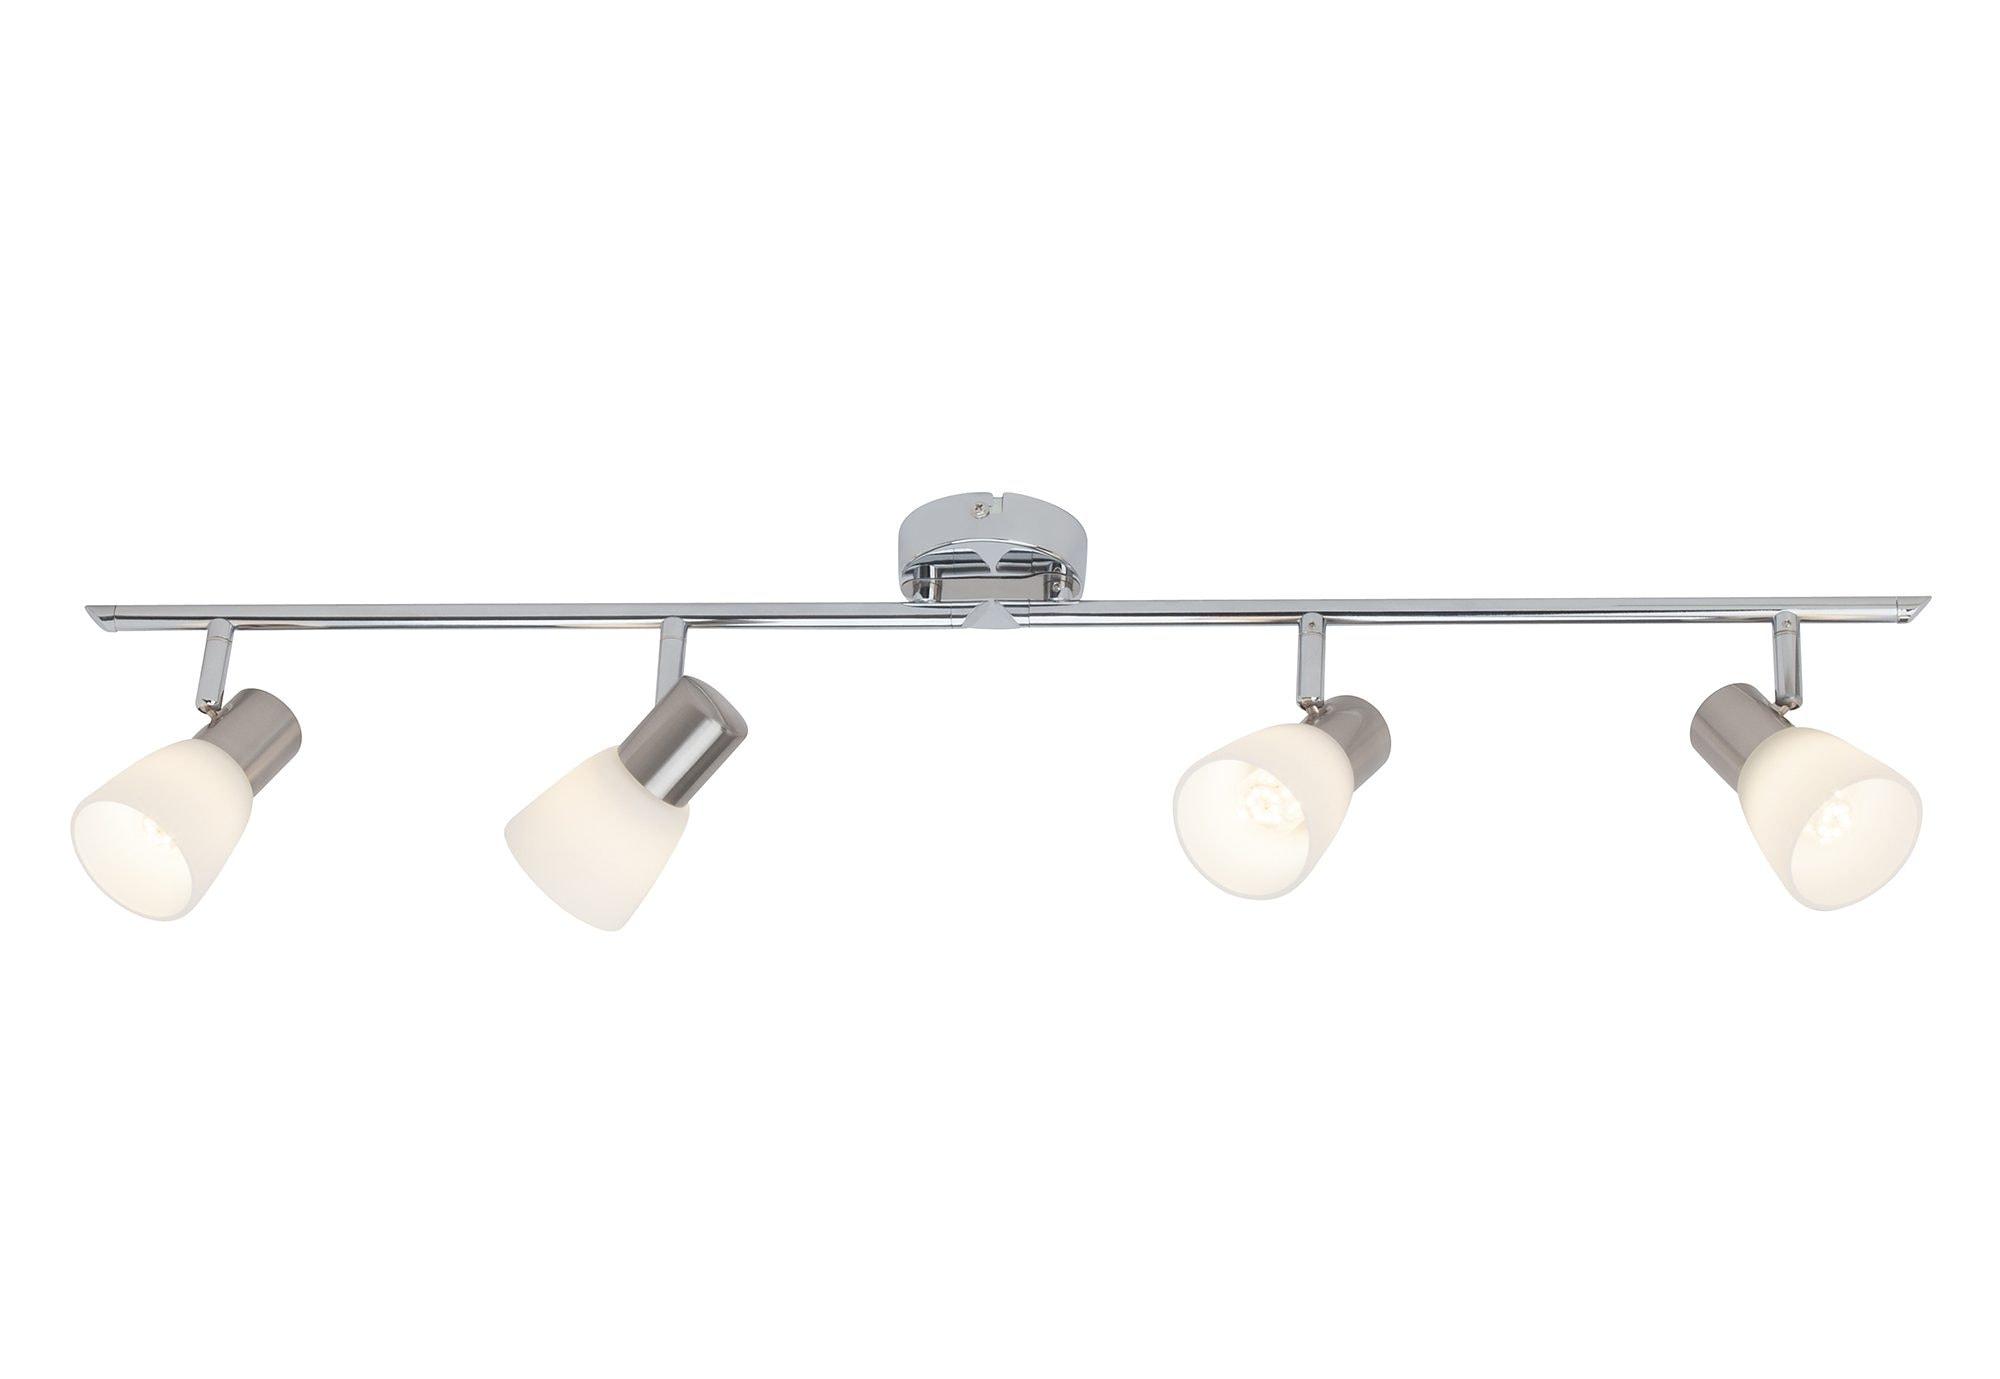 Brilliant Leuchten LED Deckenstrahler, E14, LED Deckenleuchte, LED Deckenlampe